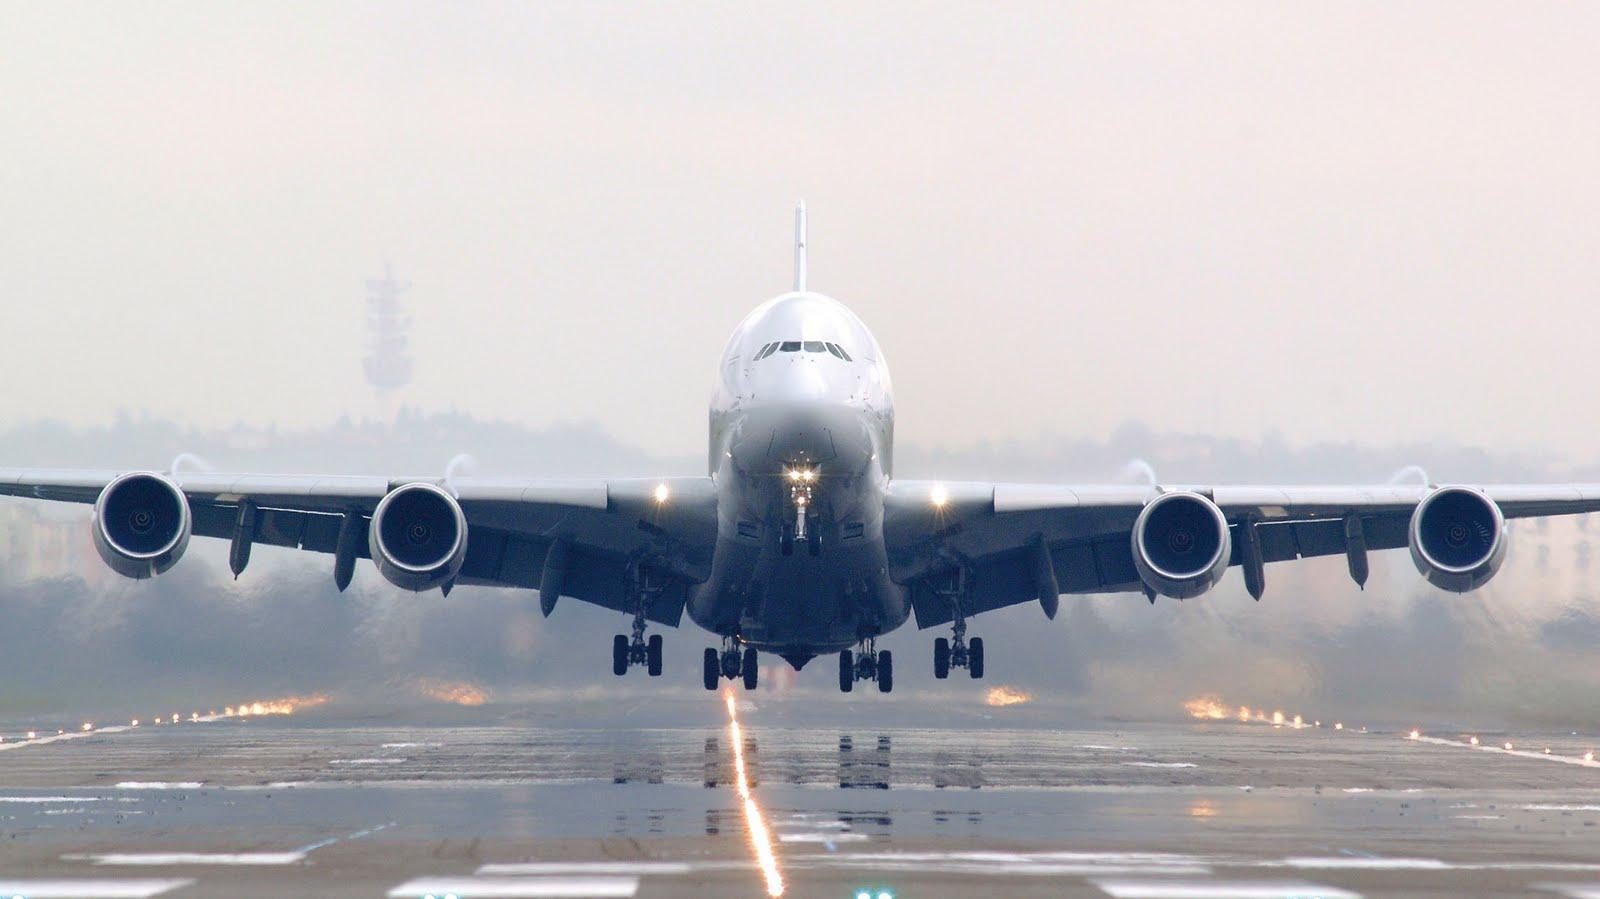 <b>Airbus A380</b> [6] <b>wallpaper</b> - Aircraft <b>wallpapers</b> - #45756